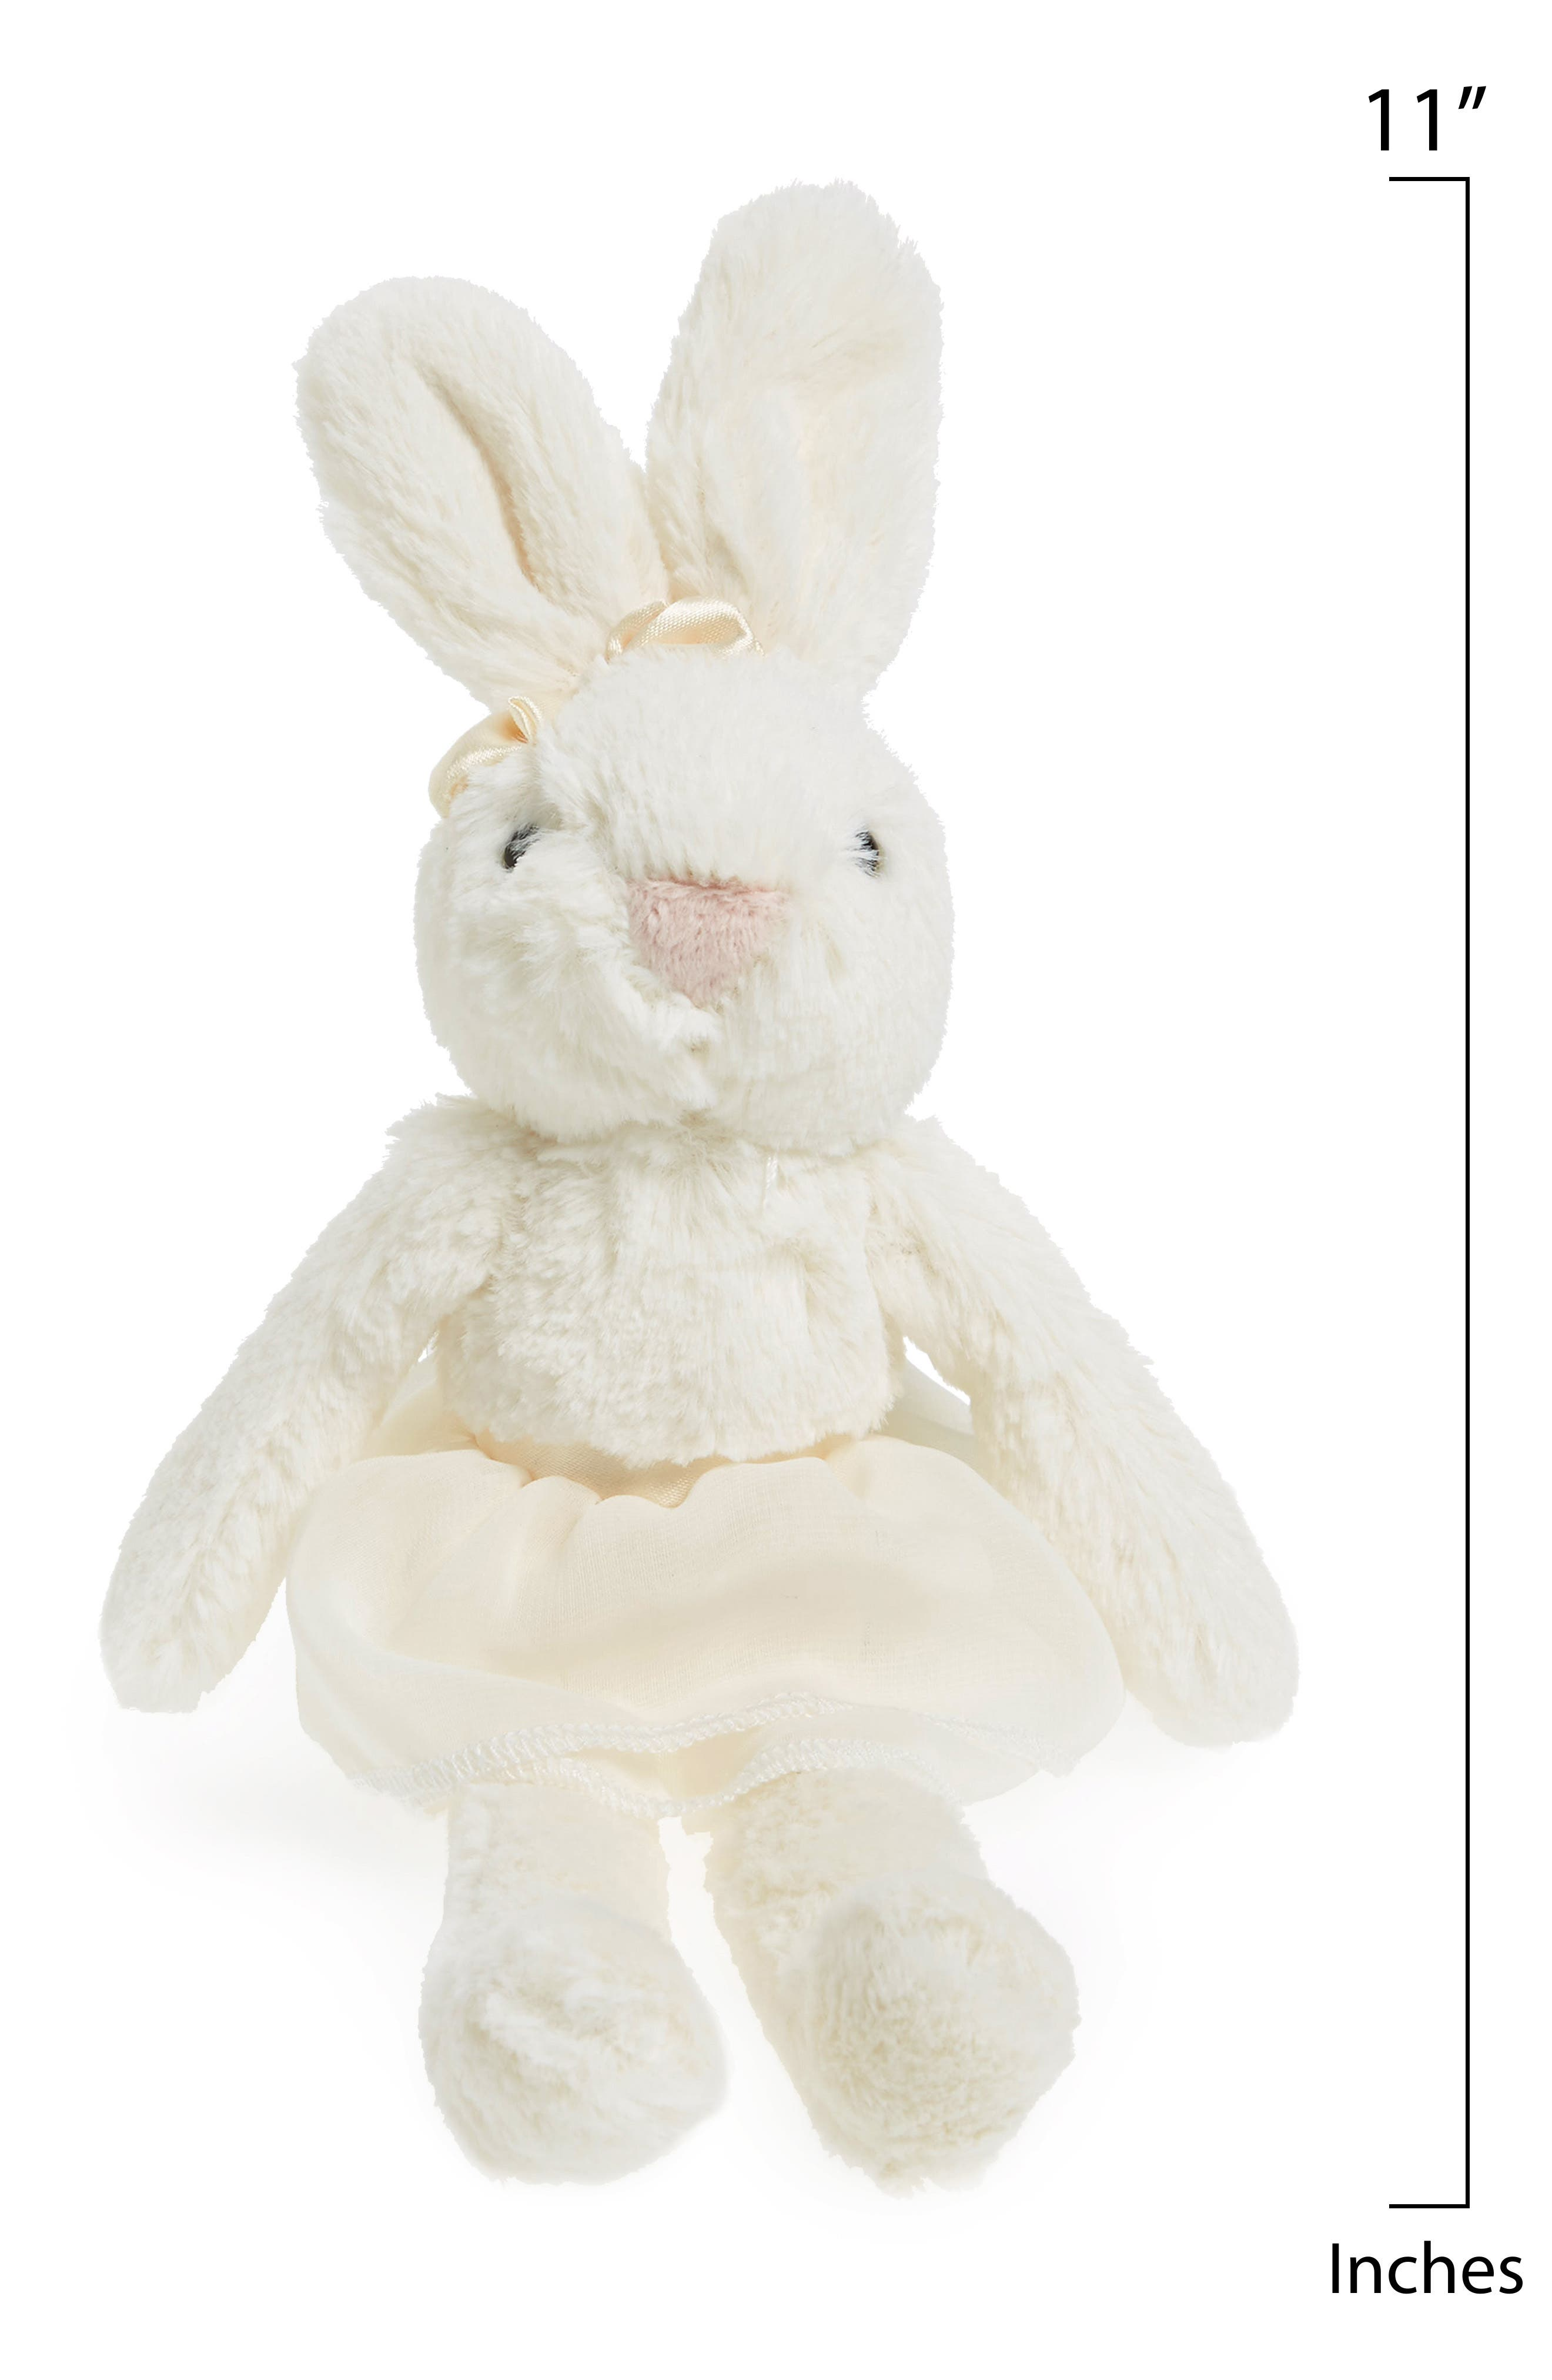 'Plum Bunny' Stuffed Animal,                             Alternate thumbnail 2, color,                             Cream